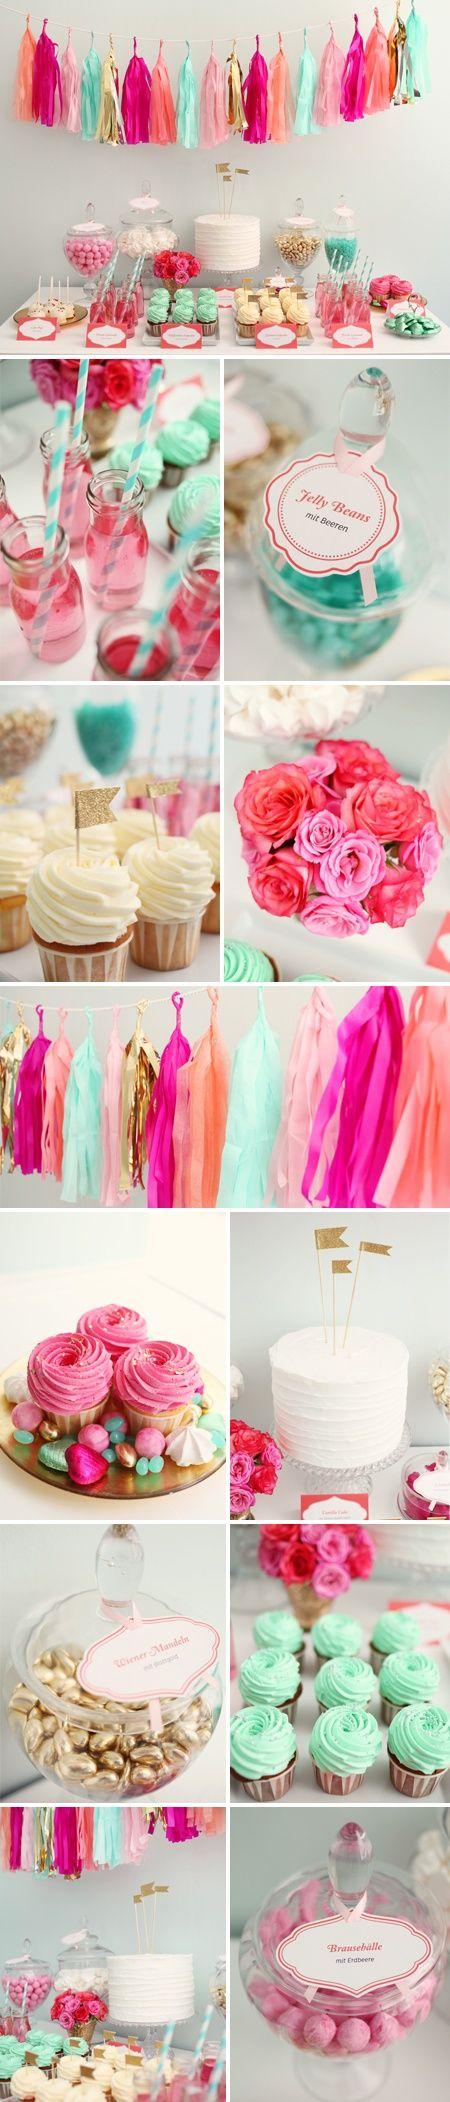 Tassel garland, cupcakes, awesomeness